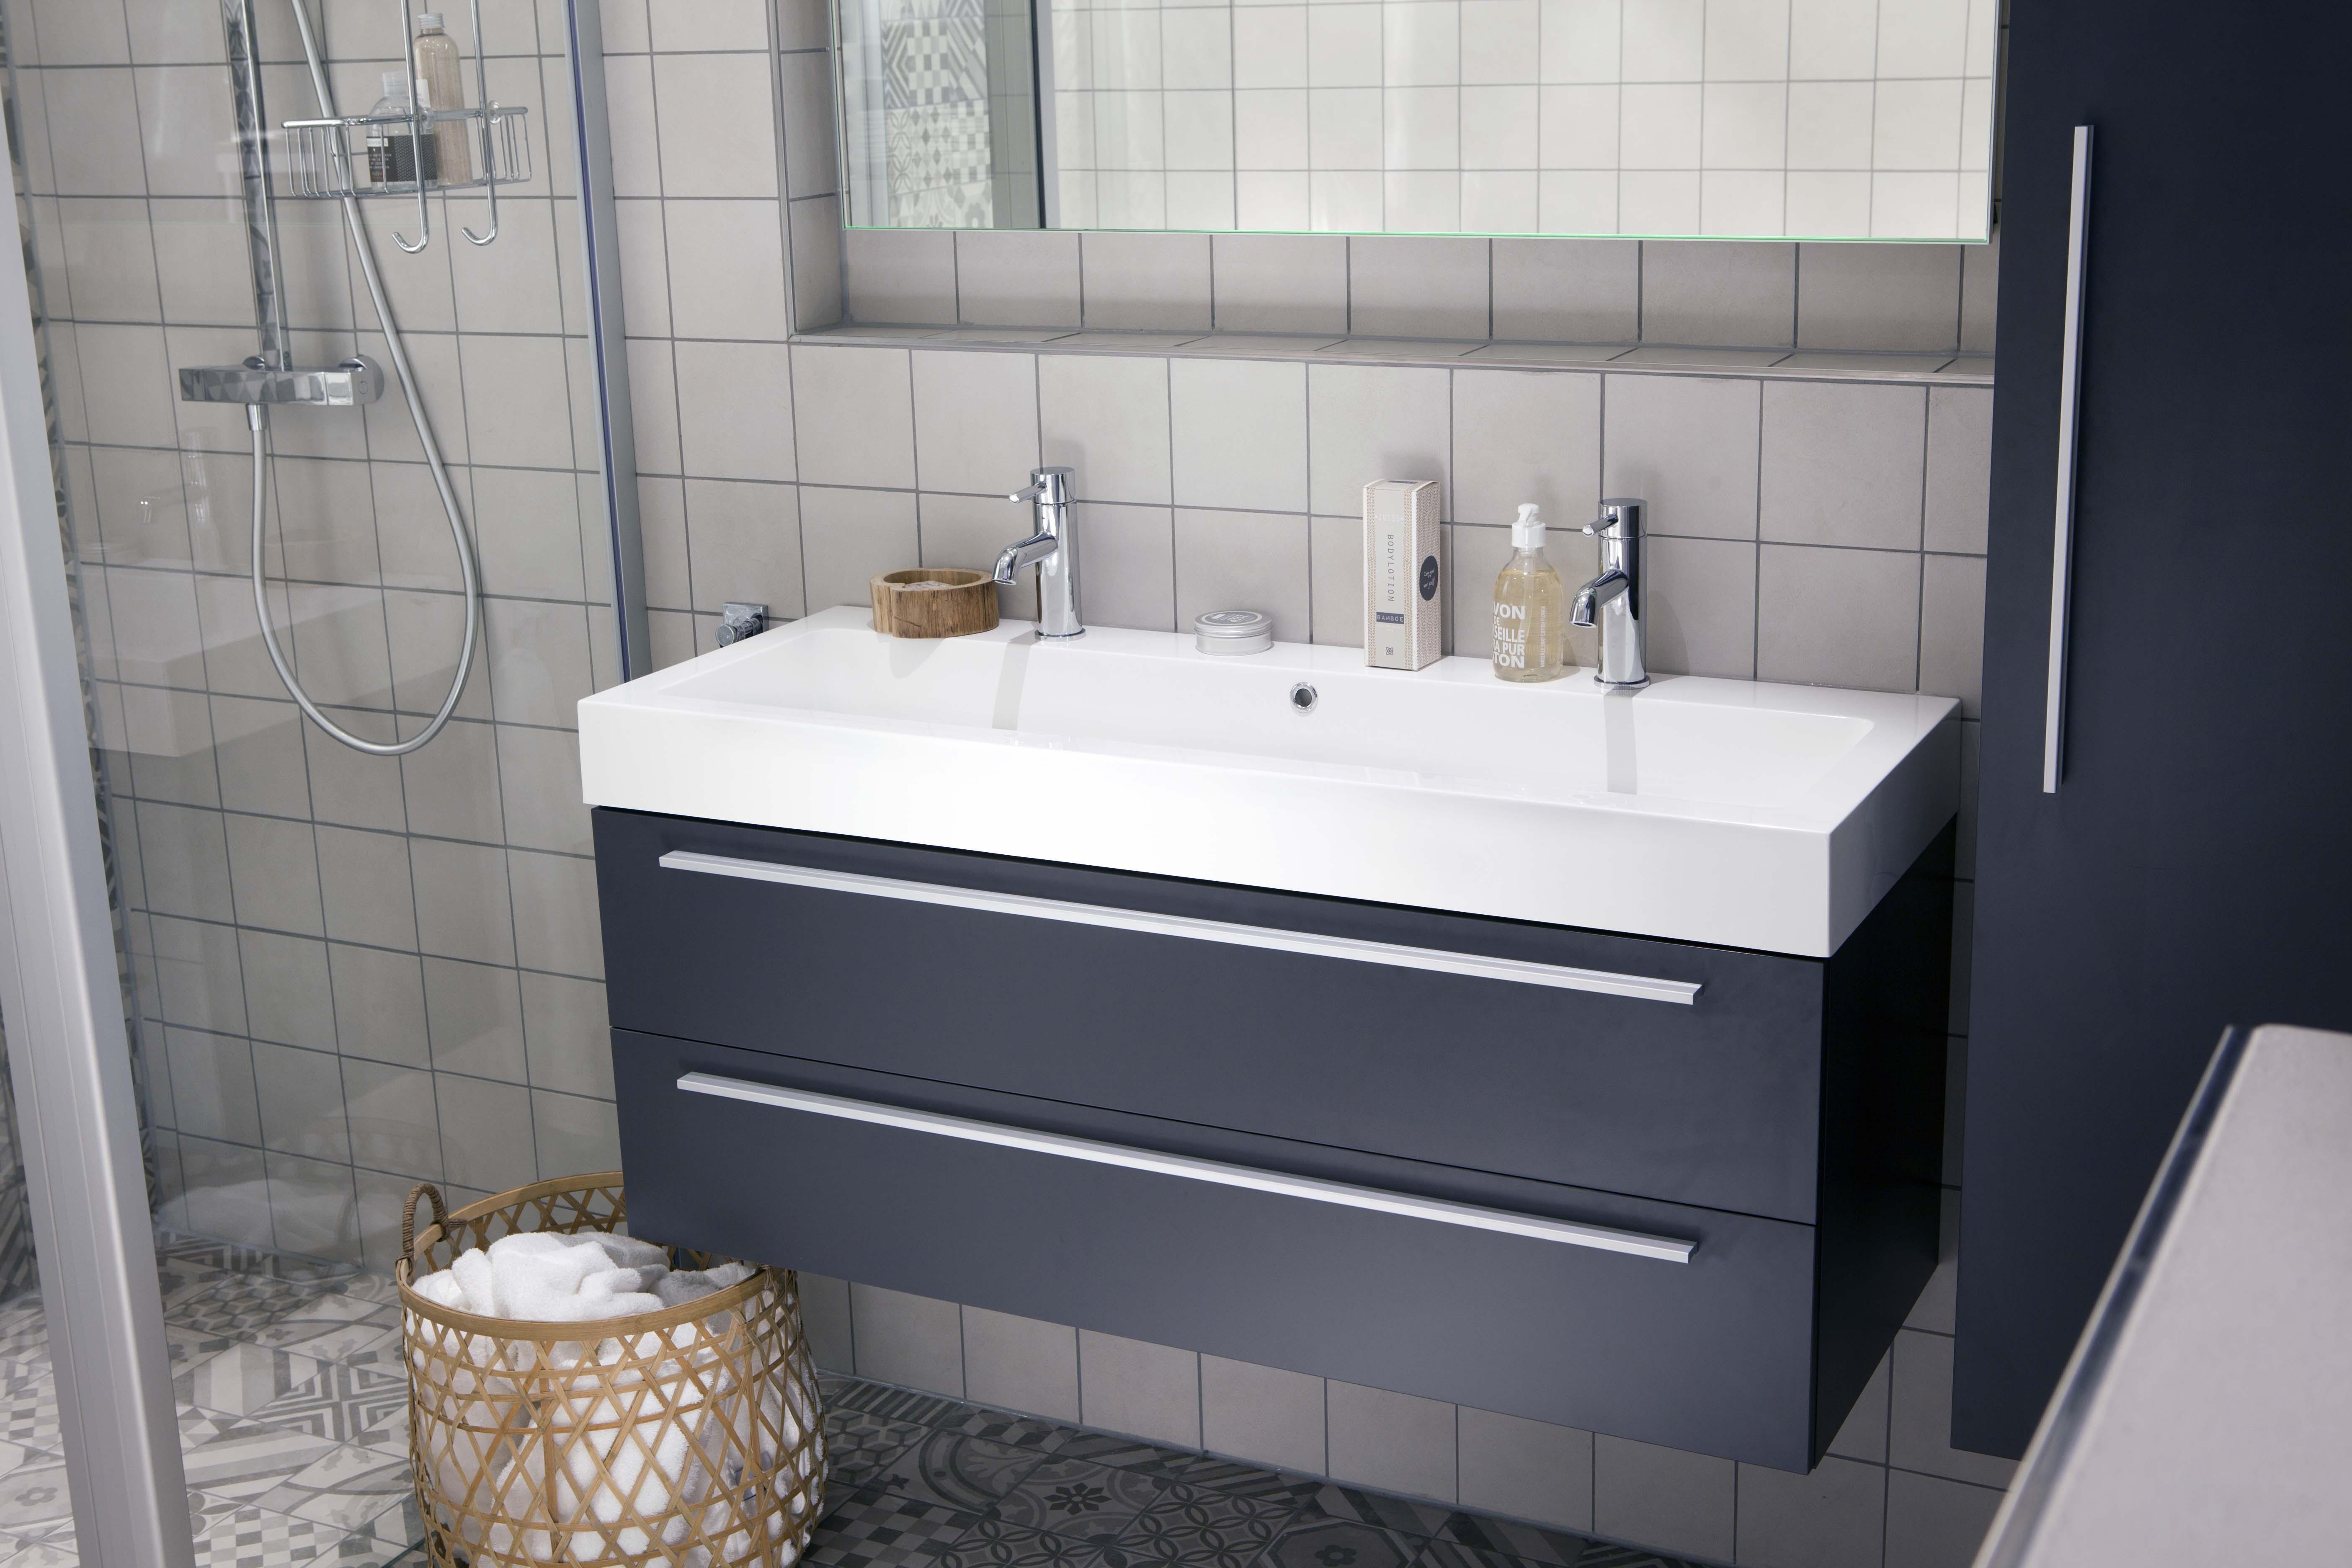 Timo sorber mg 6657 kleine badkamers - Huidige badkamer ...